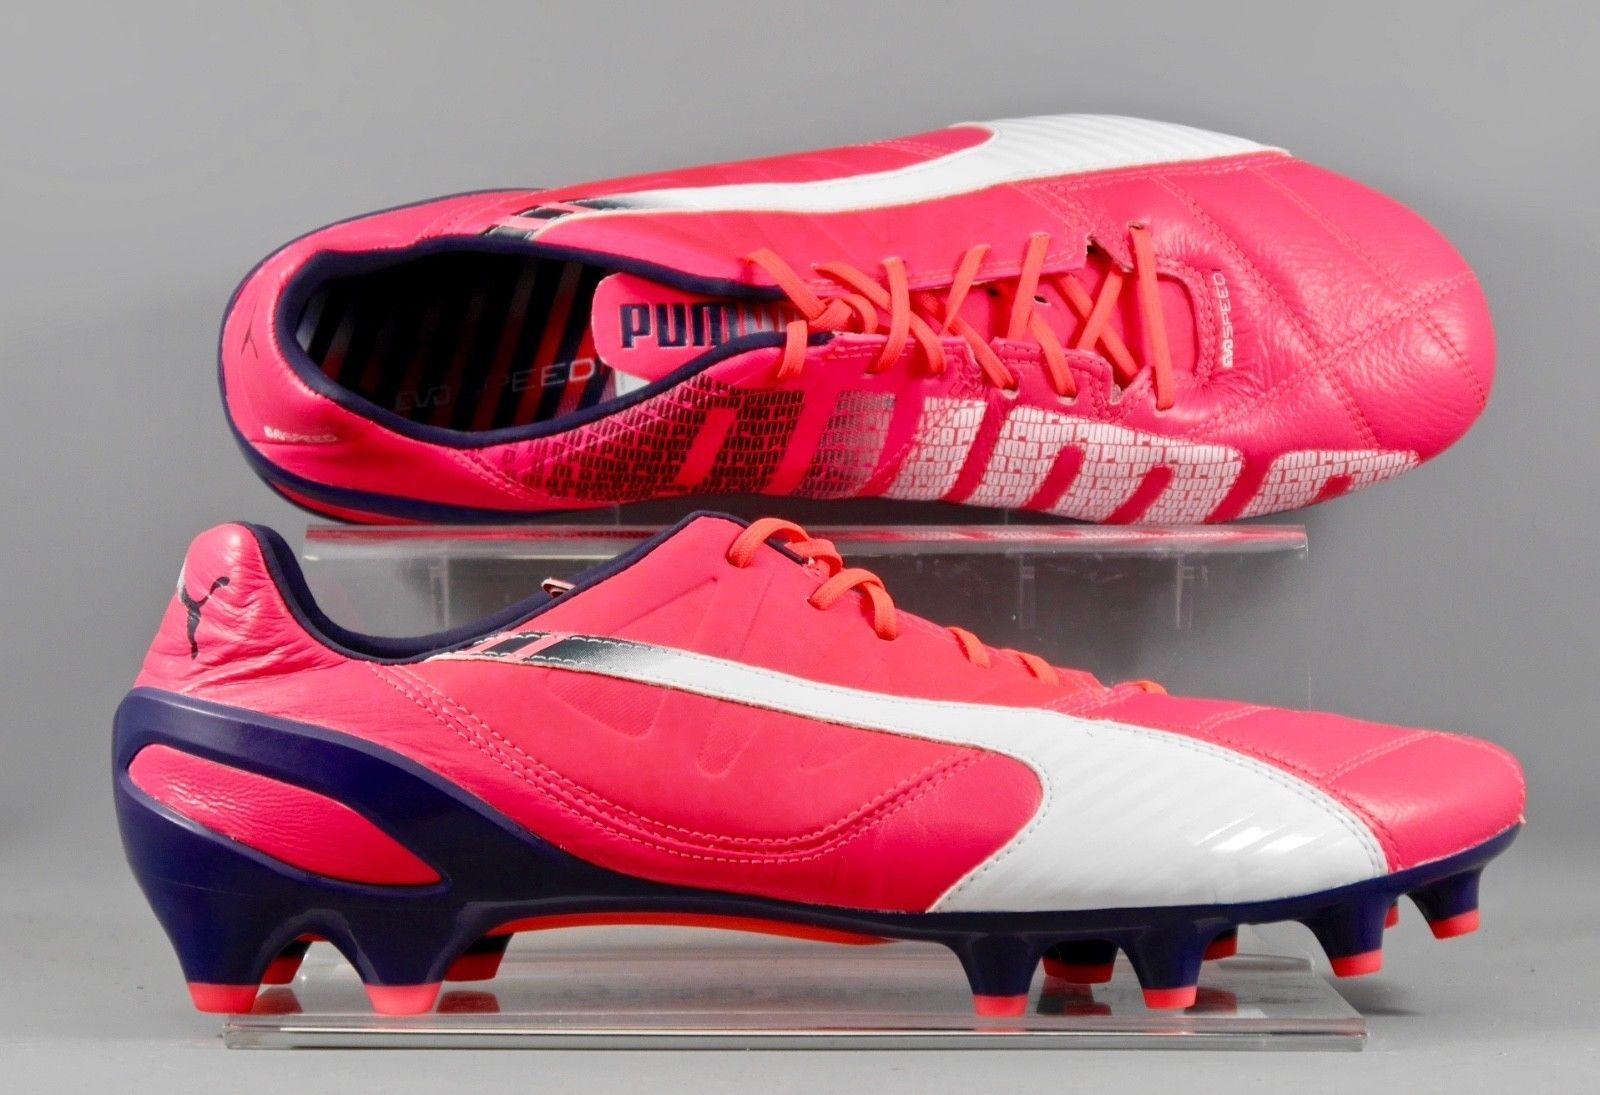 ab81b69da0f 103010-03 Puma EvoSpeed 1.3 leather FG firm ground football boots. Zapatos  De Fútbol